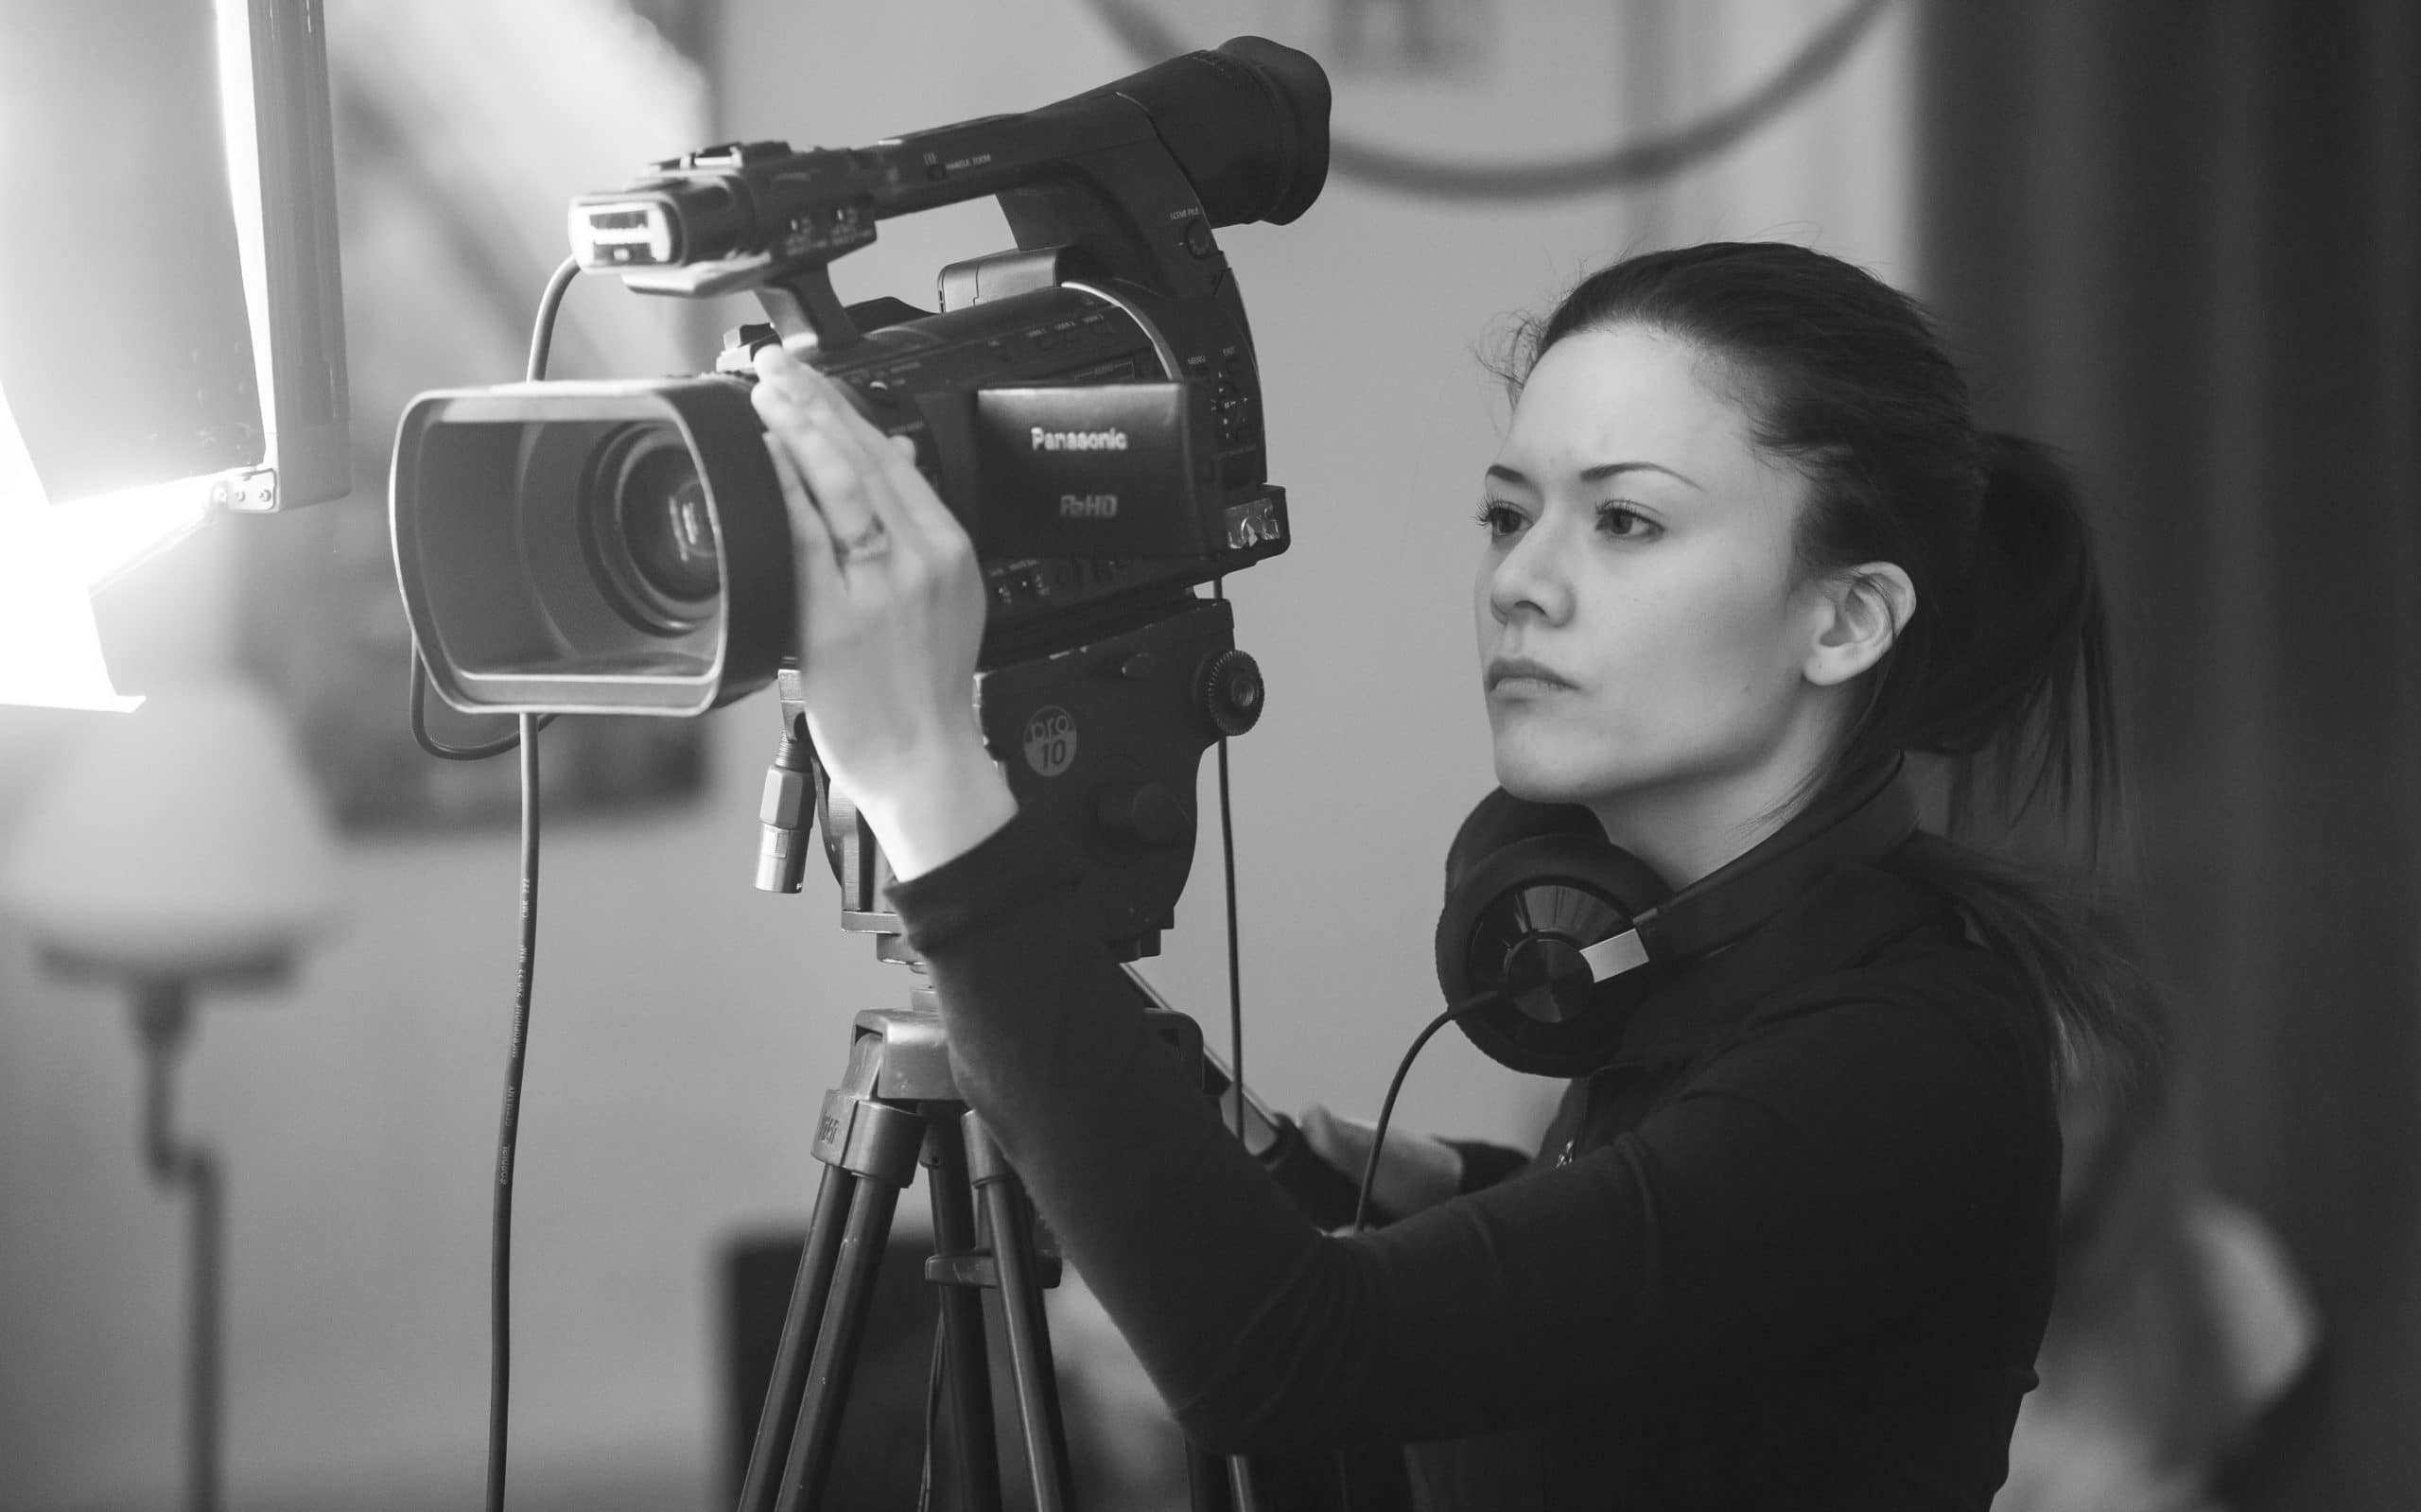 Maria filmar 2